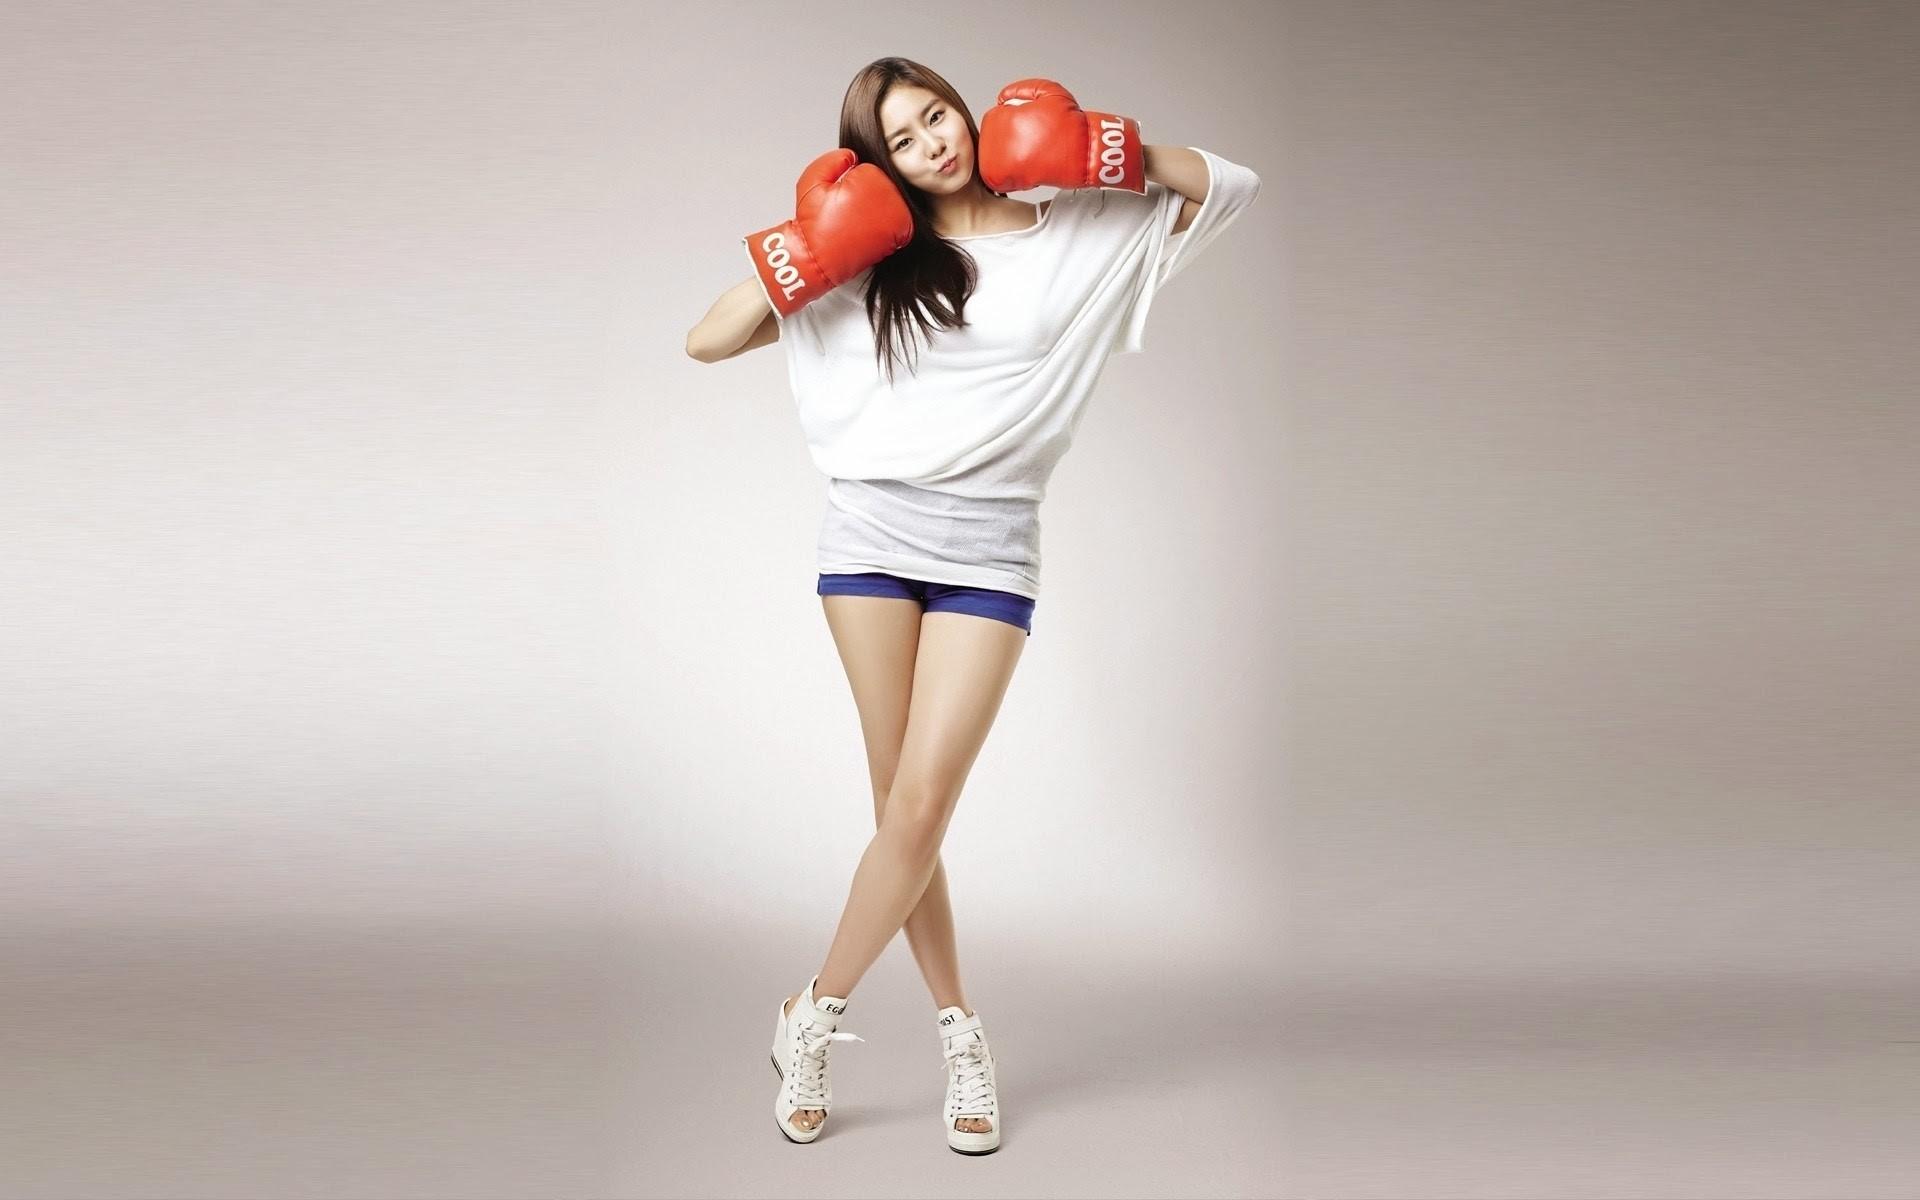 Asian Sports Girl Wallpaper